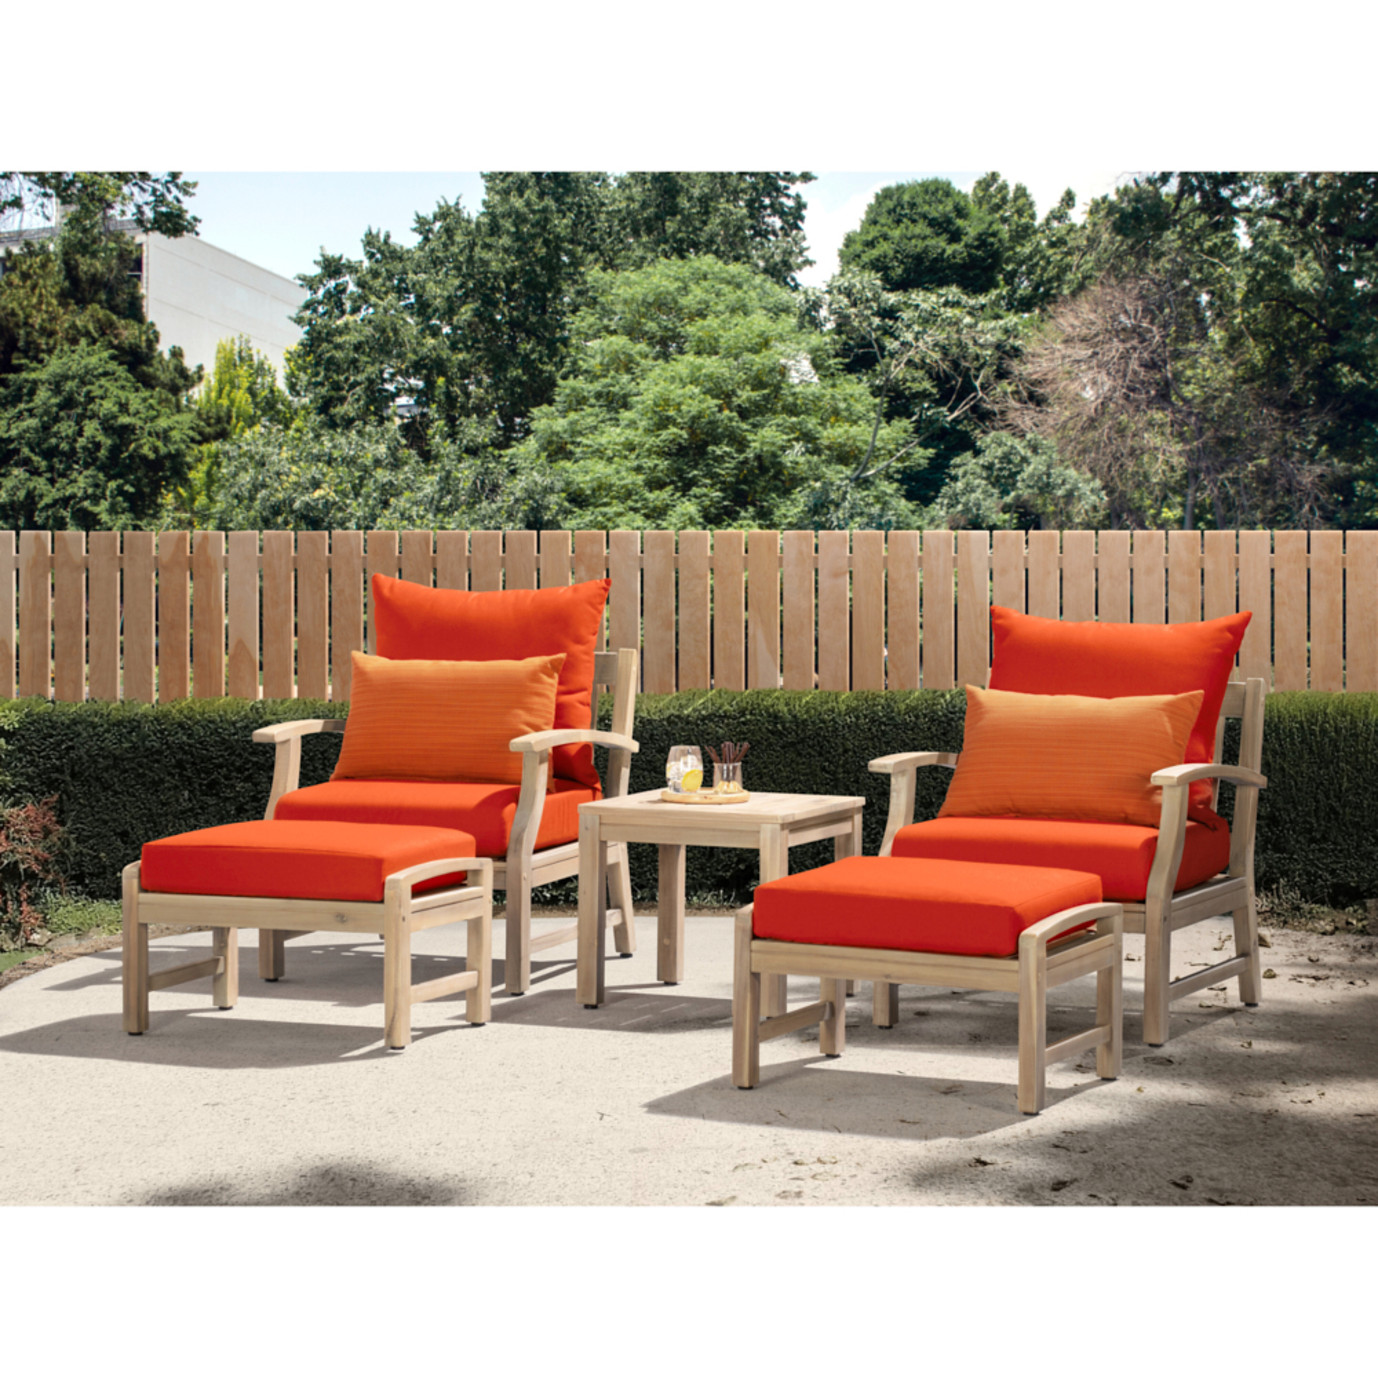 Kooper 5 Piece Club Chair & Ottoman Set - Tikka Orange